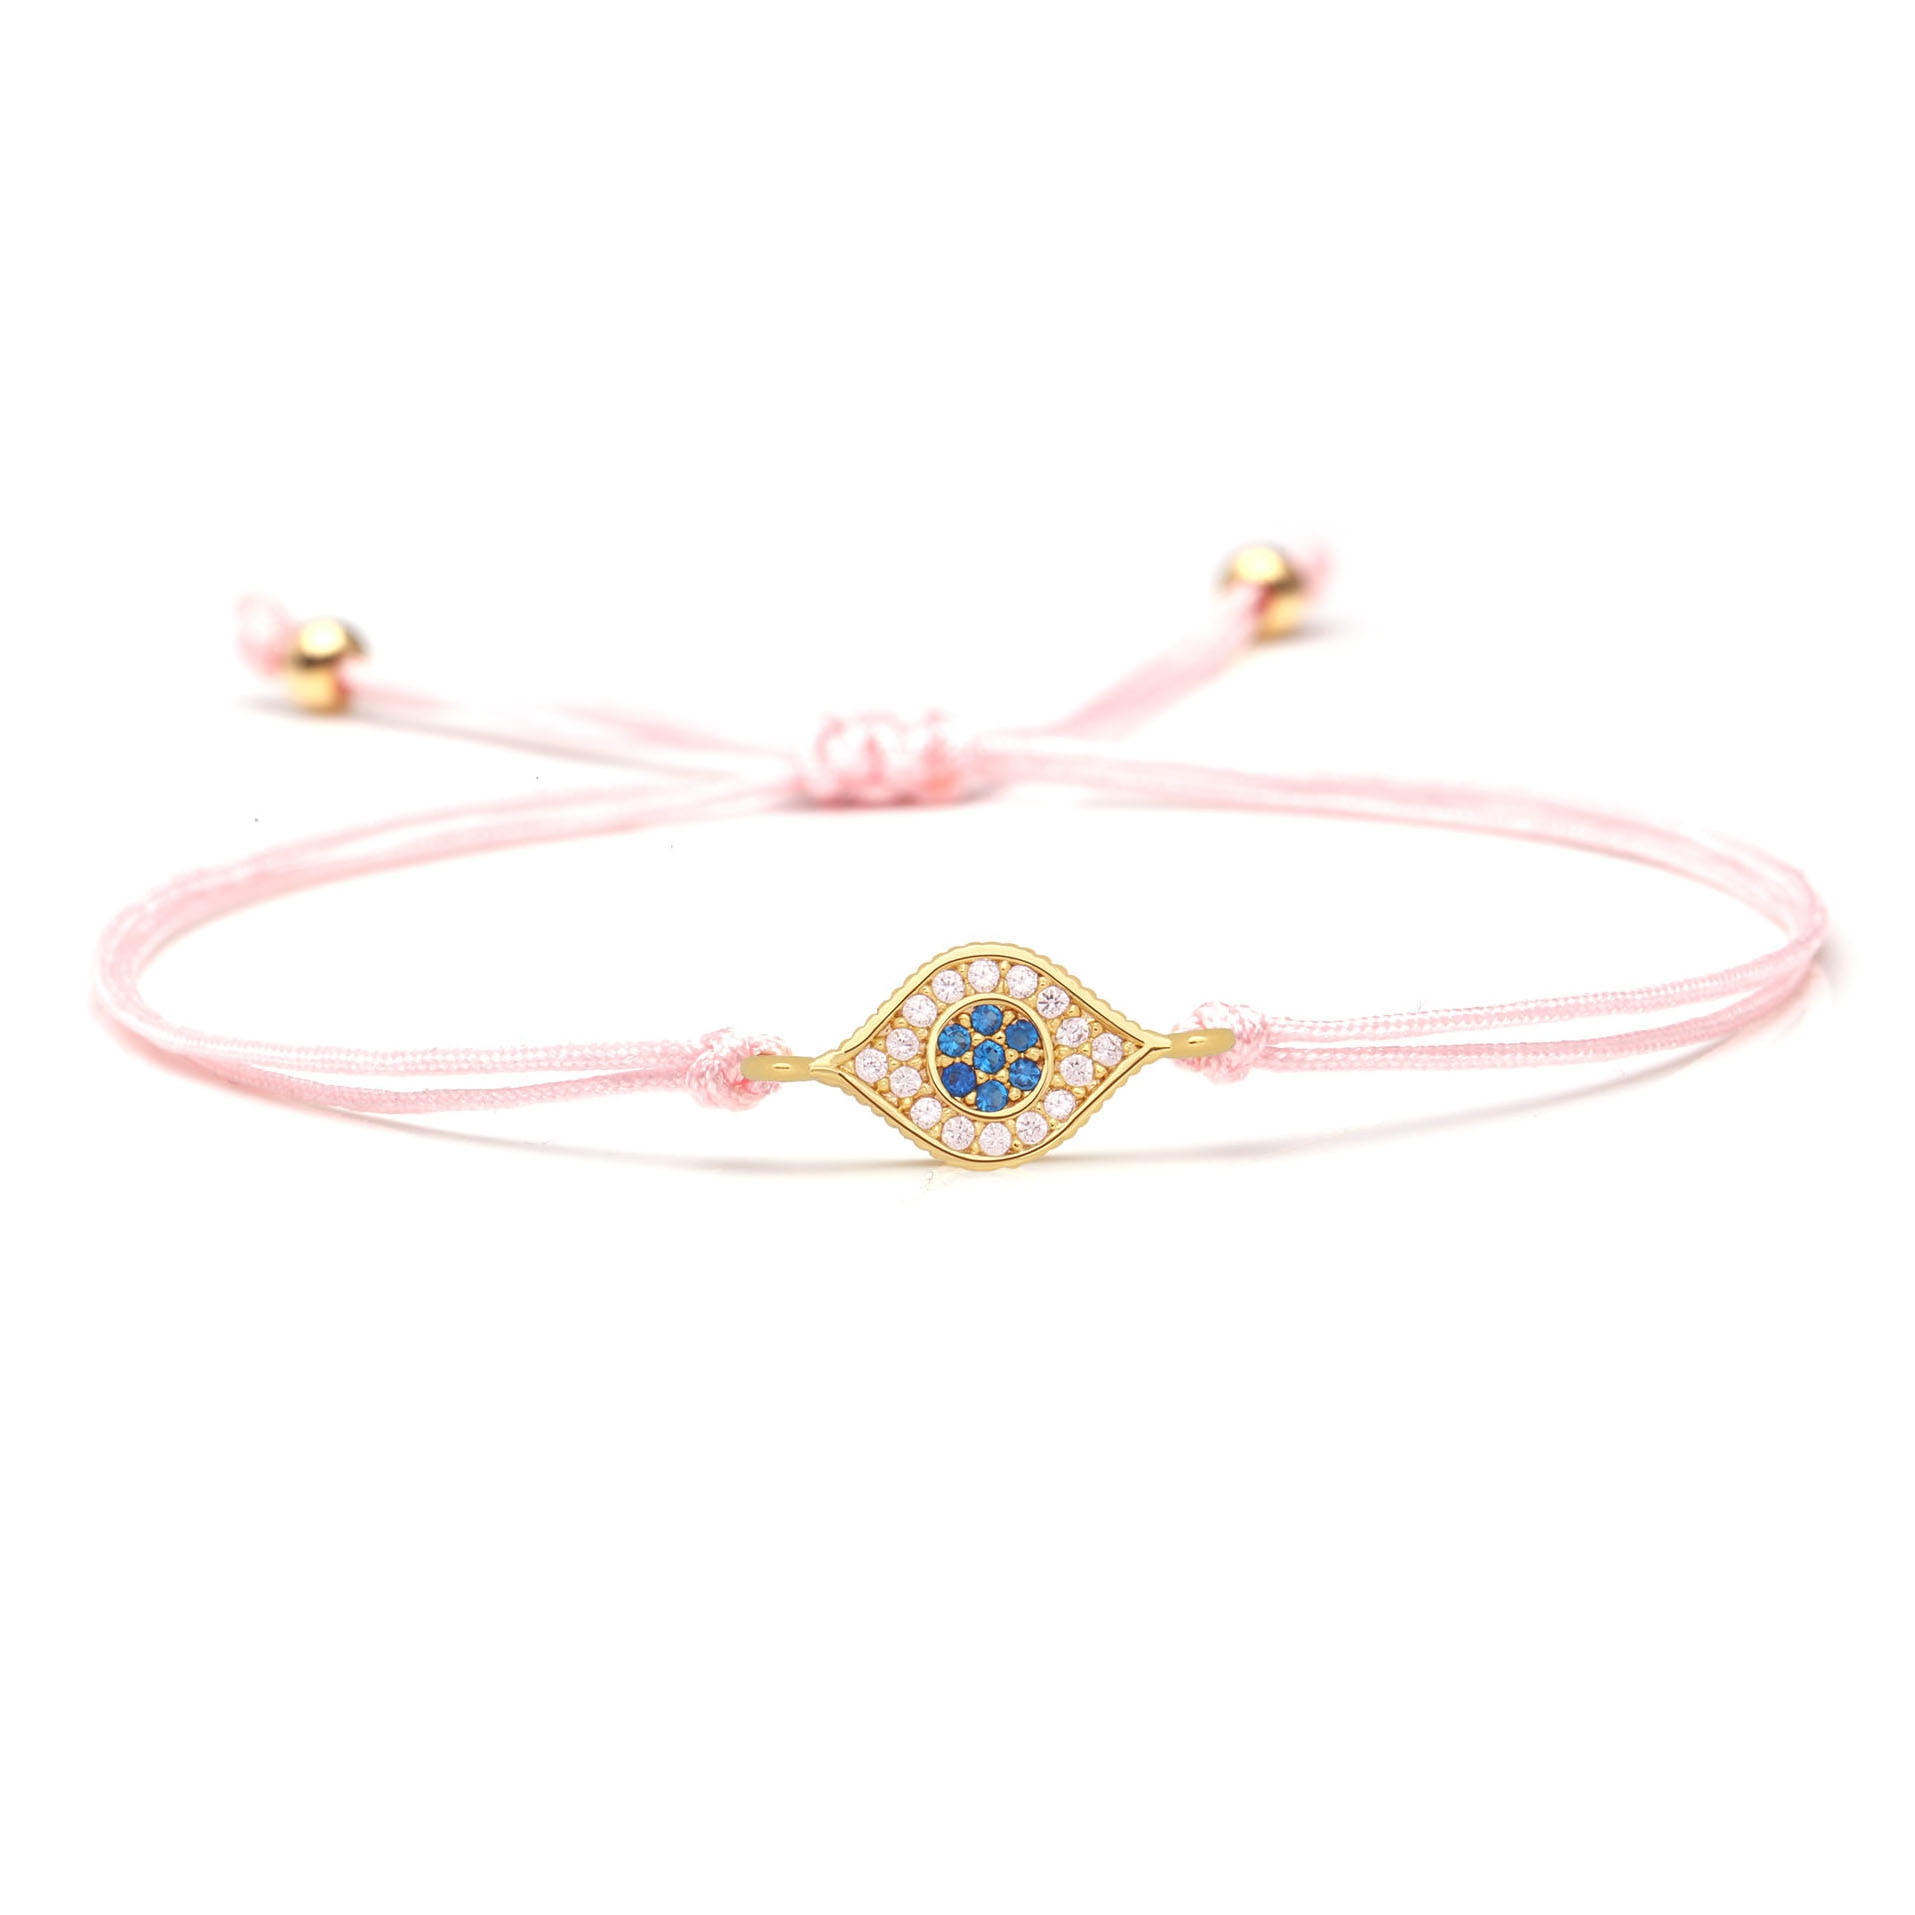 Weiß Zirkon Kristall Blau CZ Evil Eye Charm Armband Frauen 2019 Neue Mode Zirkonia Kupfer Auge Rosa Rot String schmuck